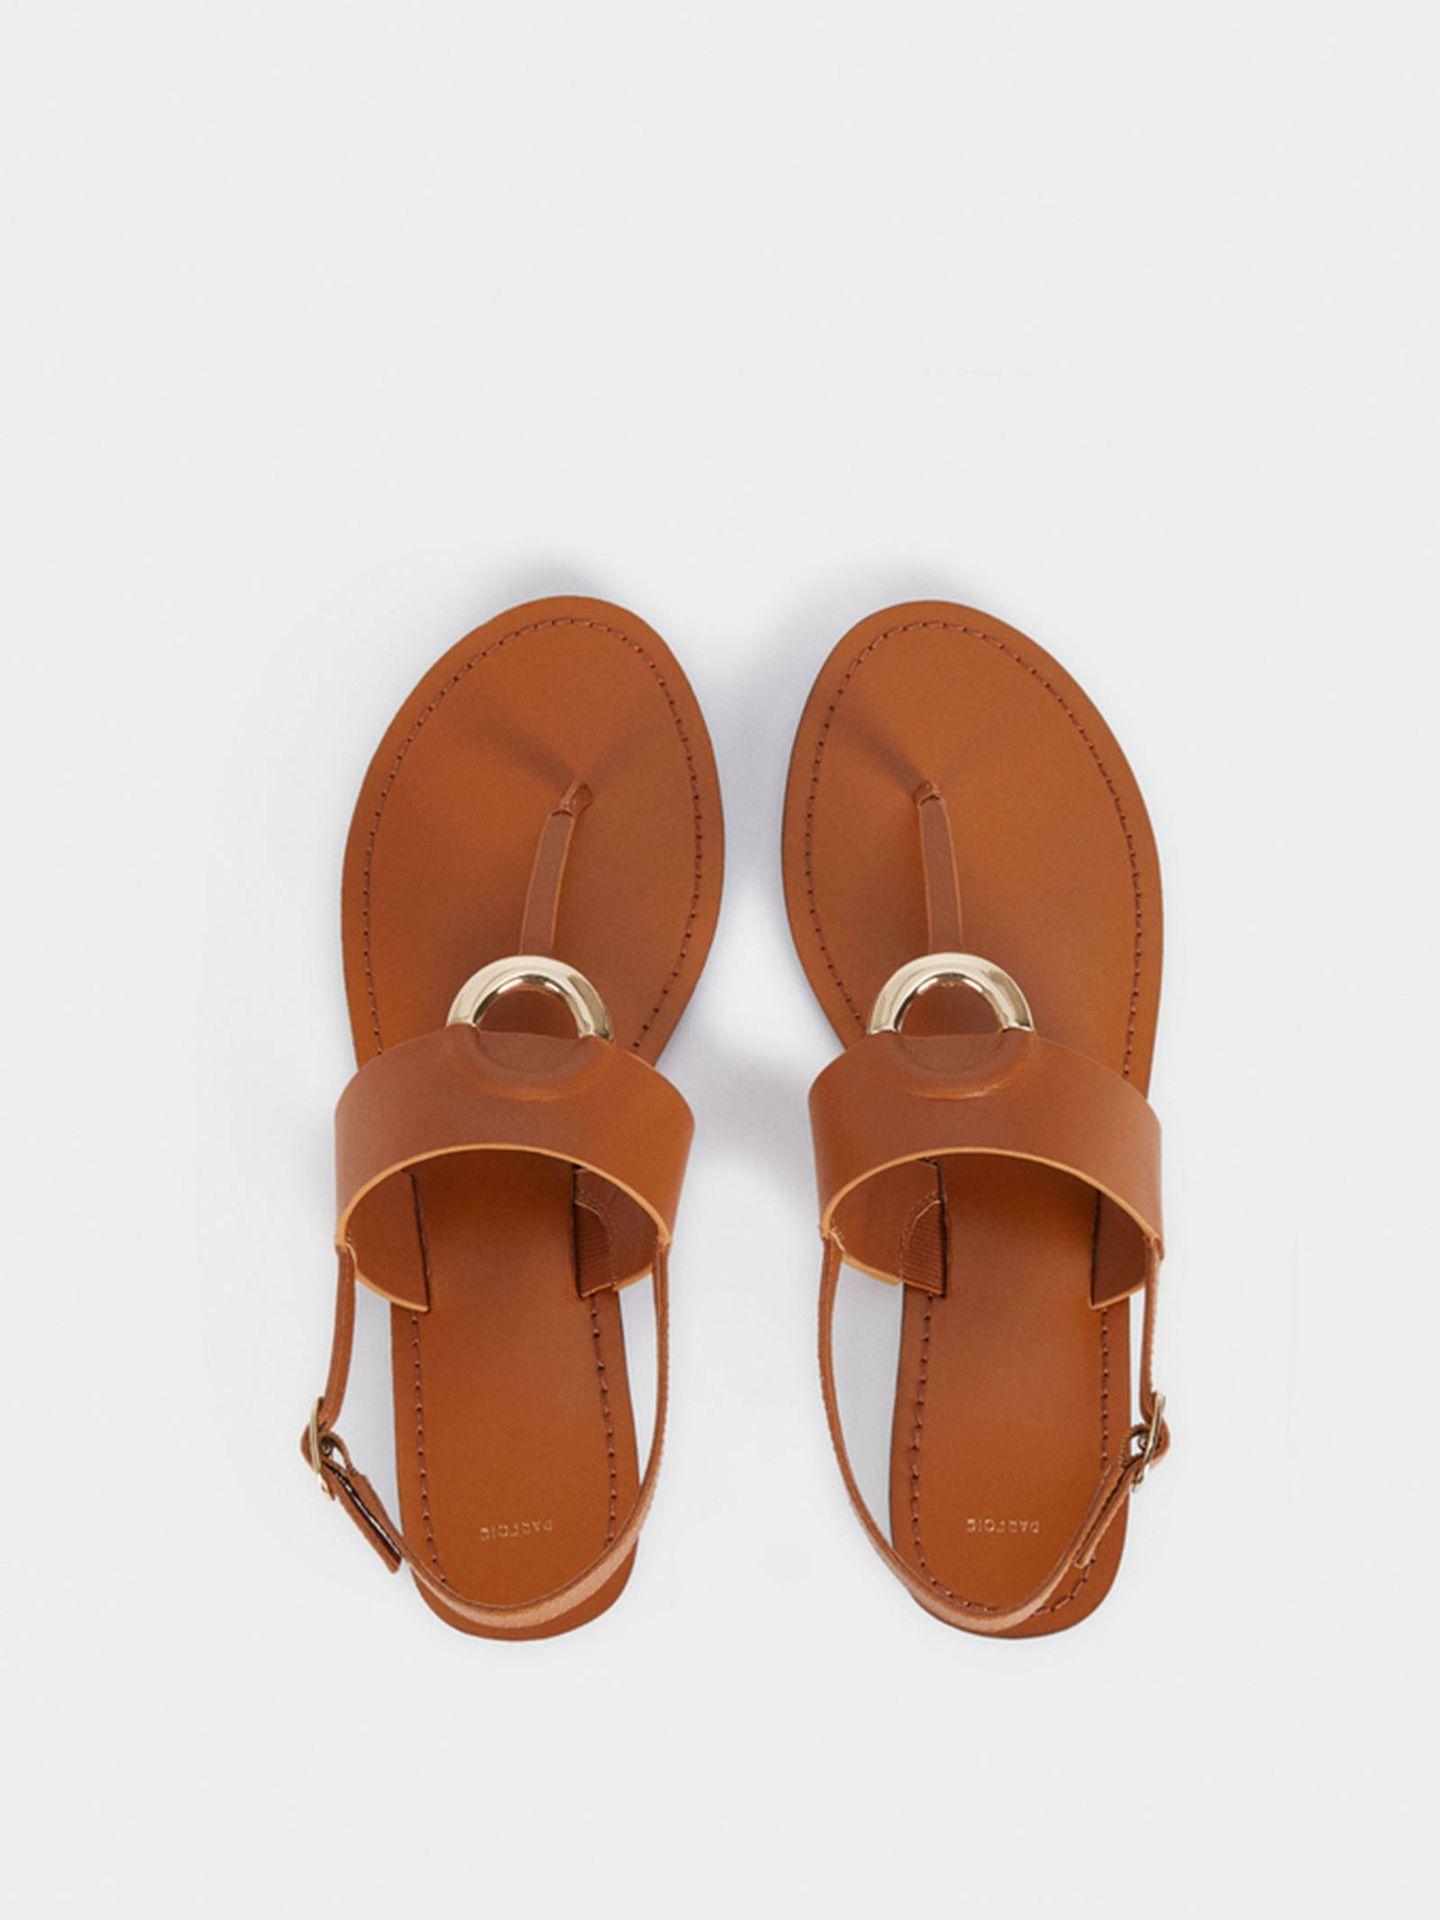 Sandalias planas de Parfois. (Cortesía)